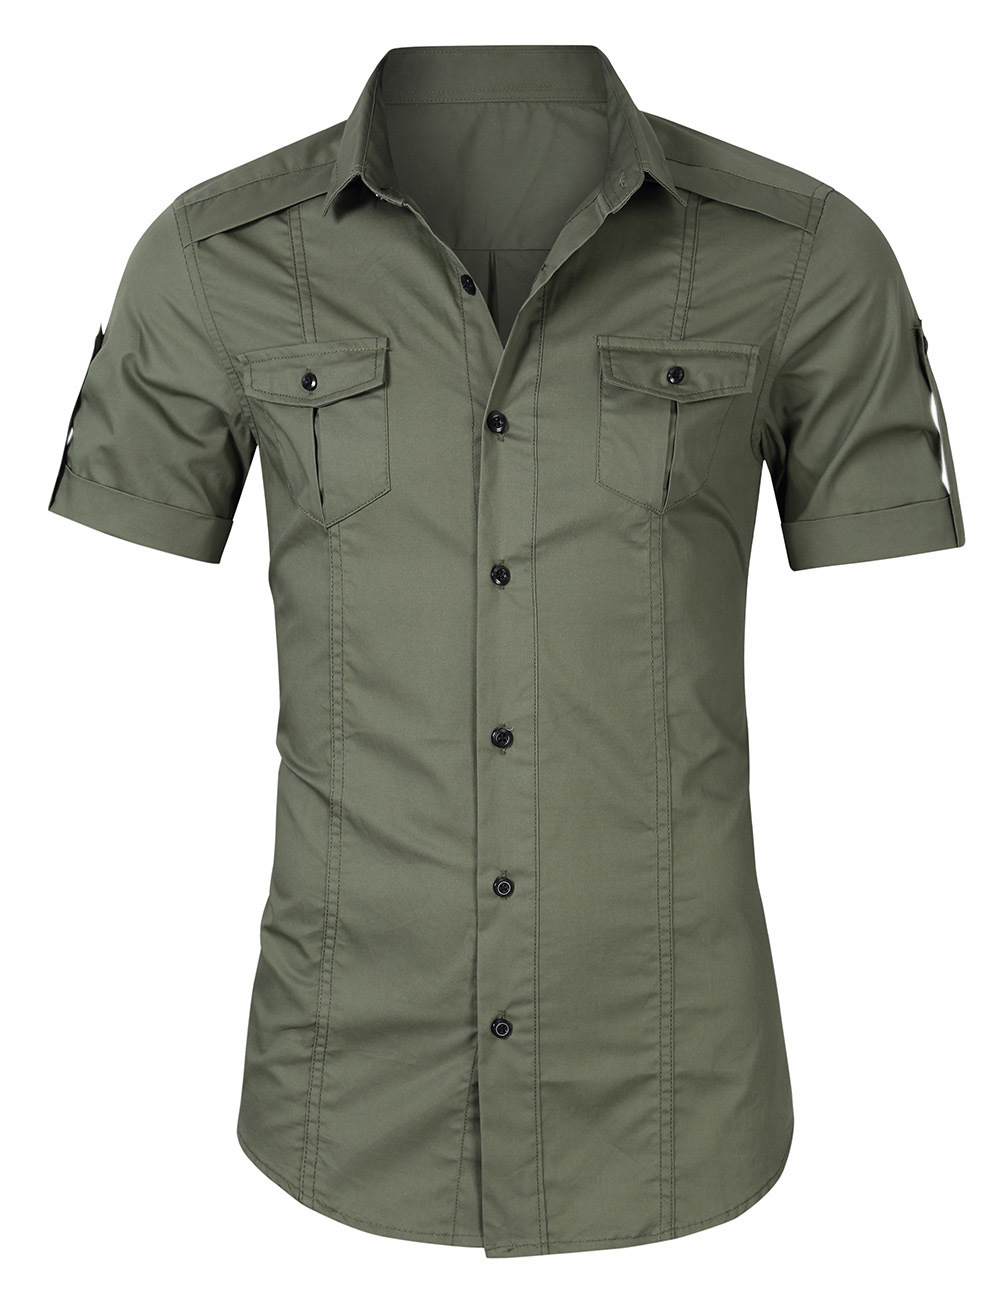 Summer Loose Short Sleeve Casual Shirt Slim Fit Boys Overalls Safari Shirt Fashion Cotton Military Green Social Oversized Tops